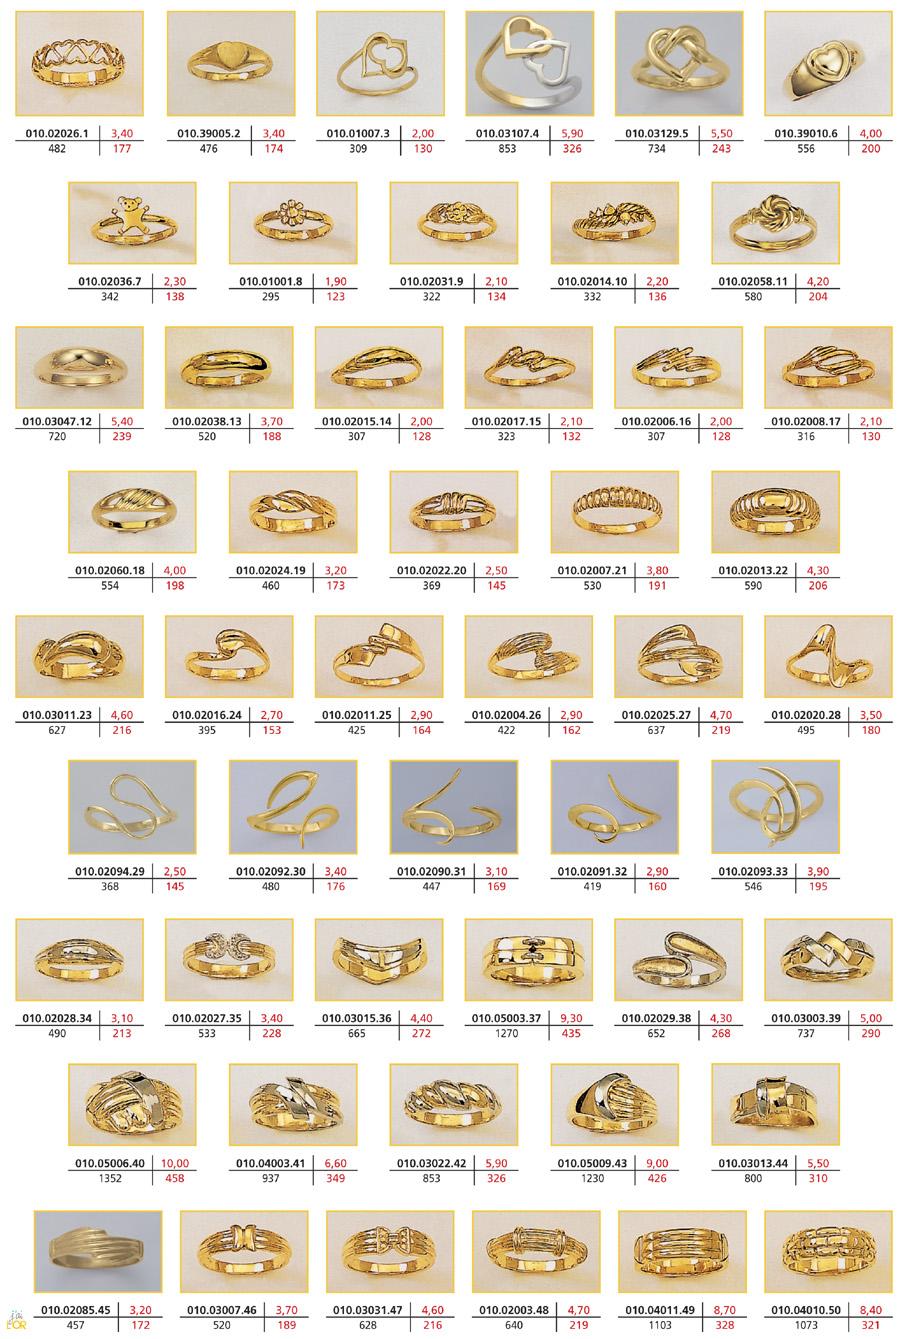 prix d'une bague en or